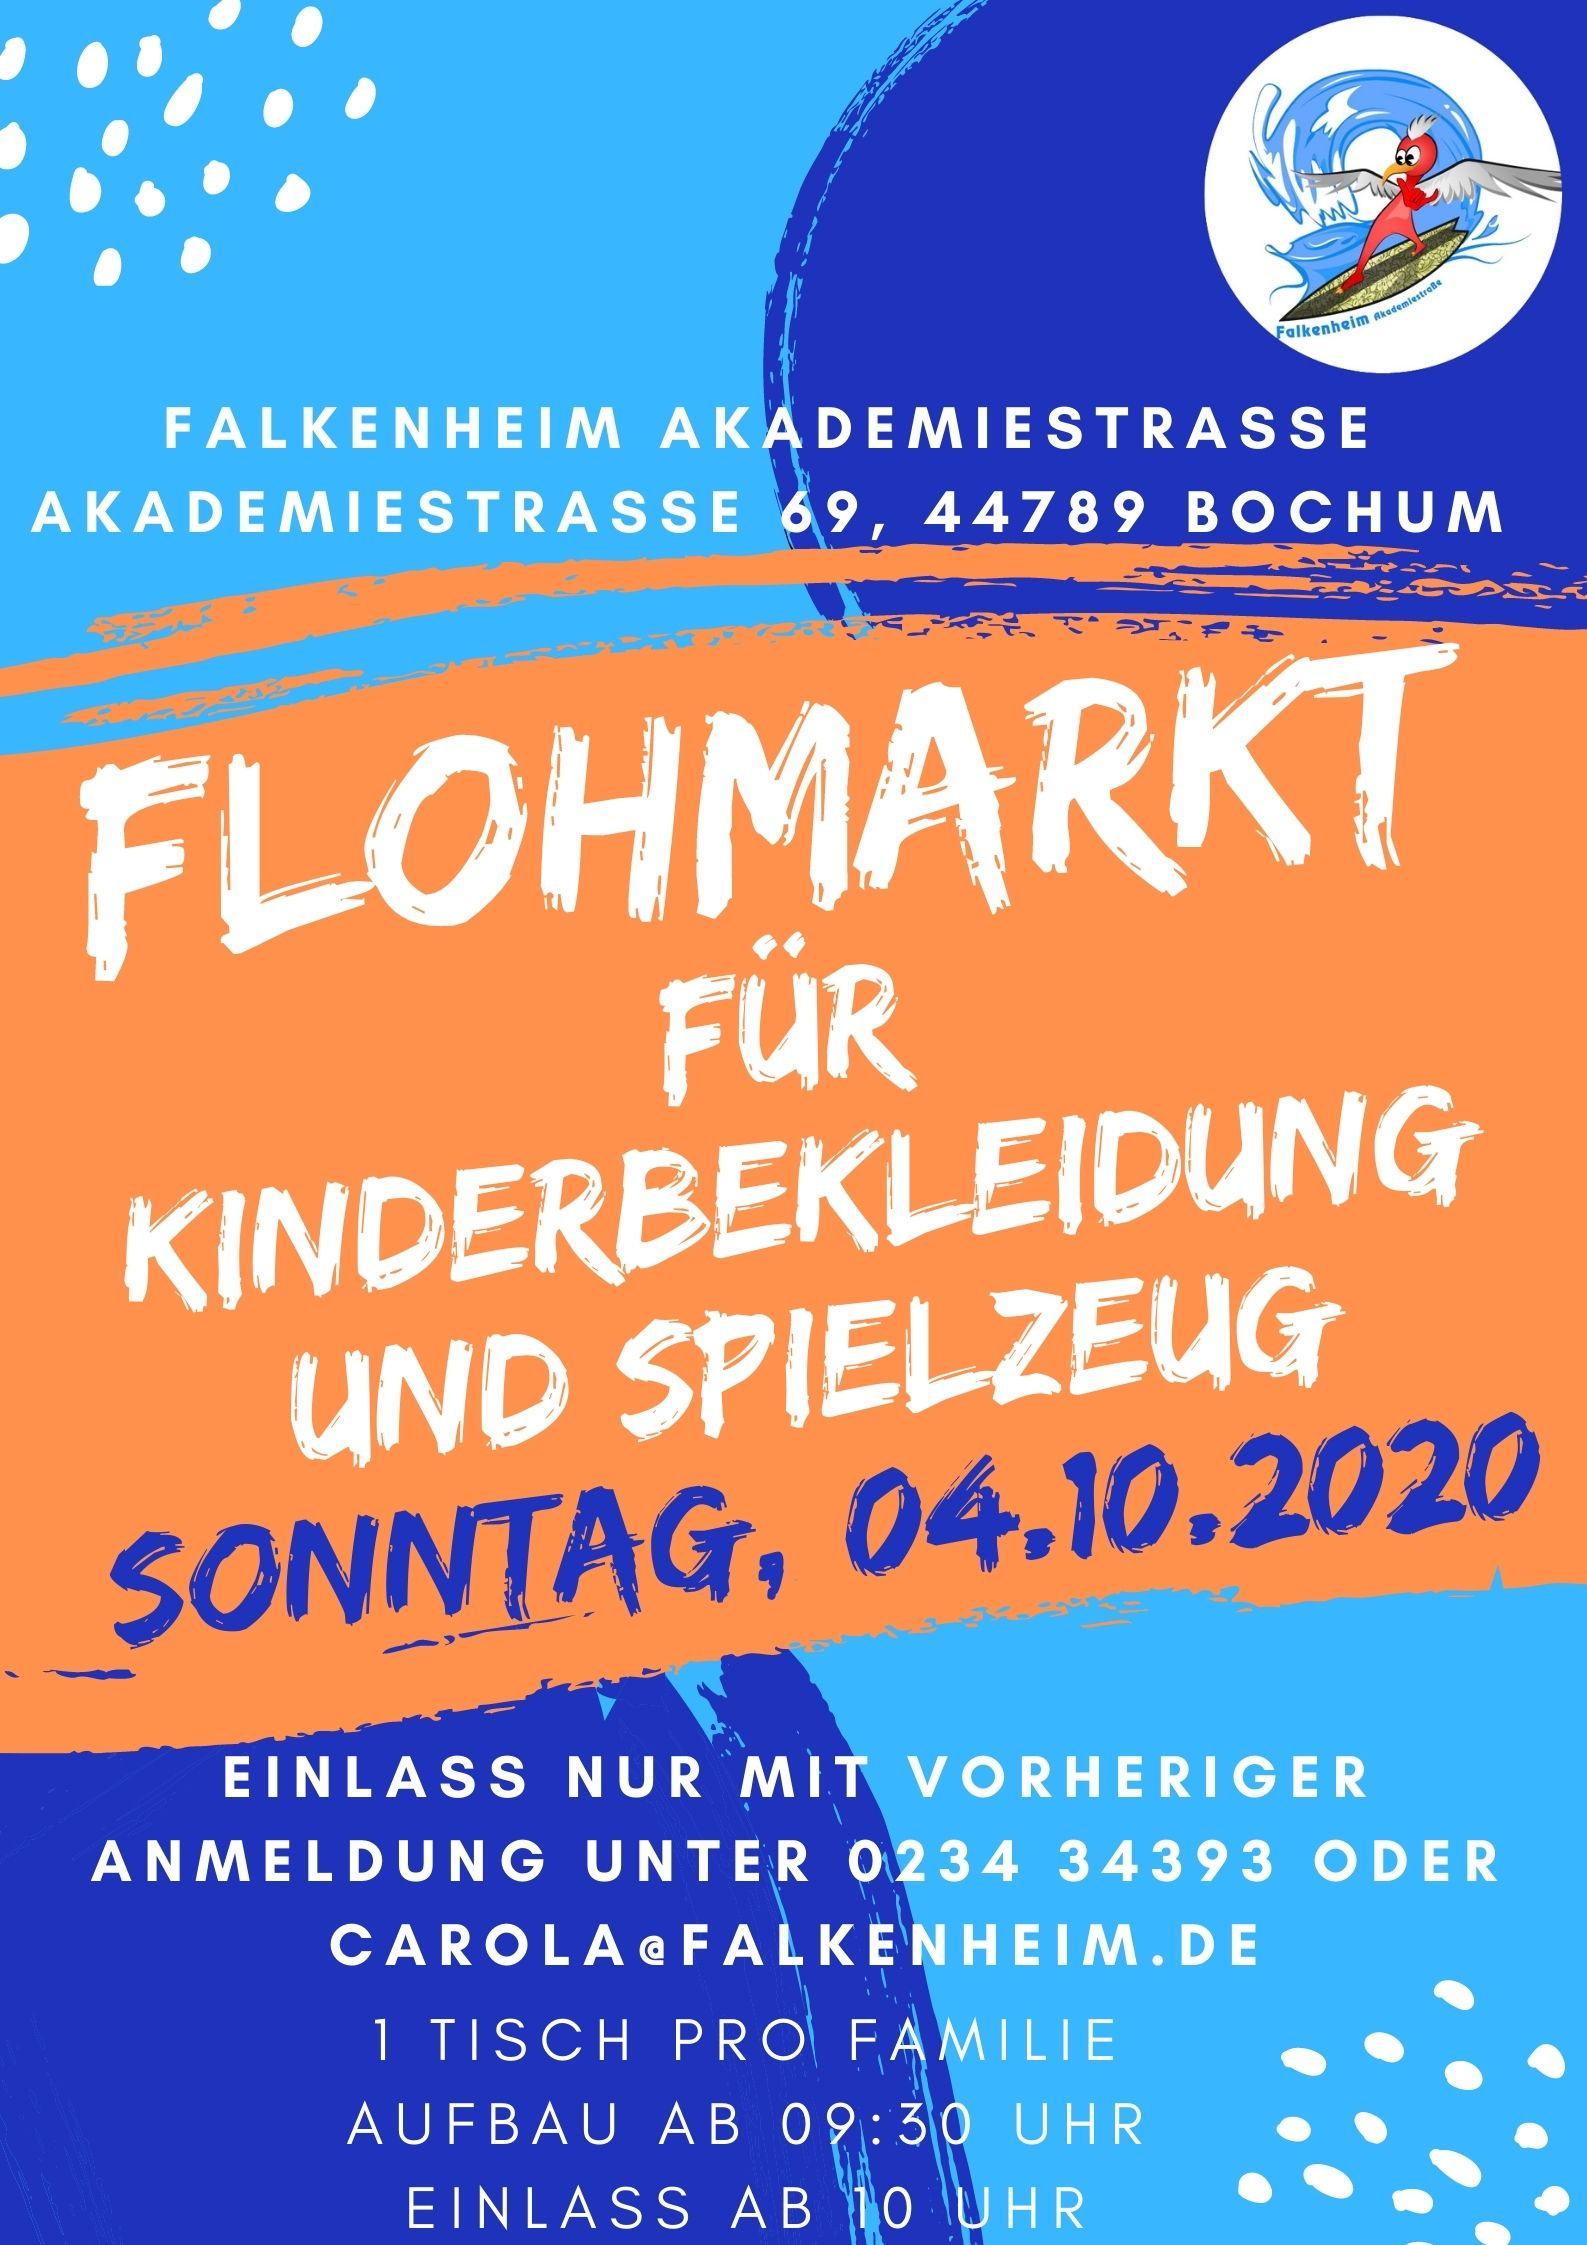 flohmarkt_1.jpg